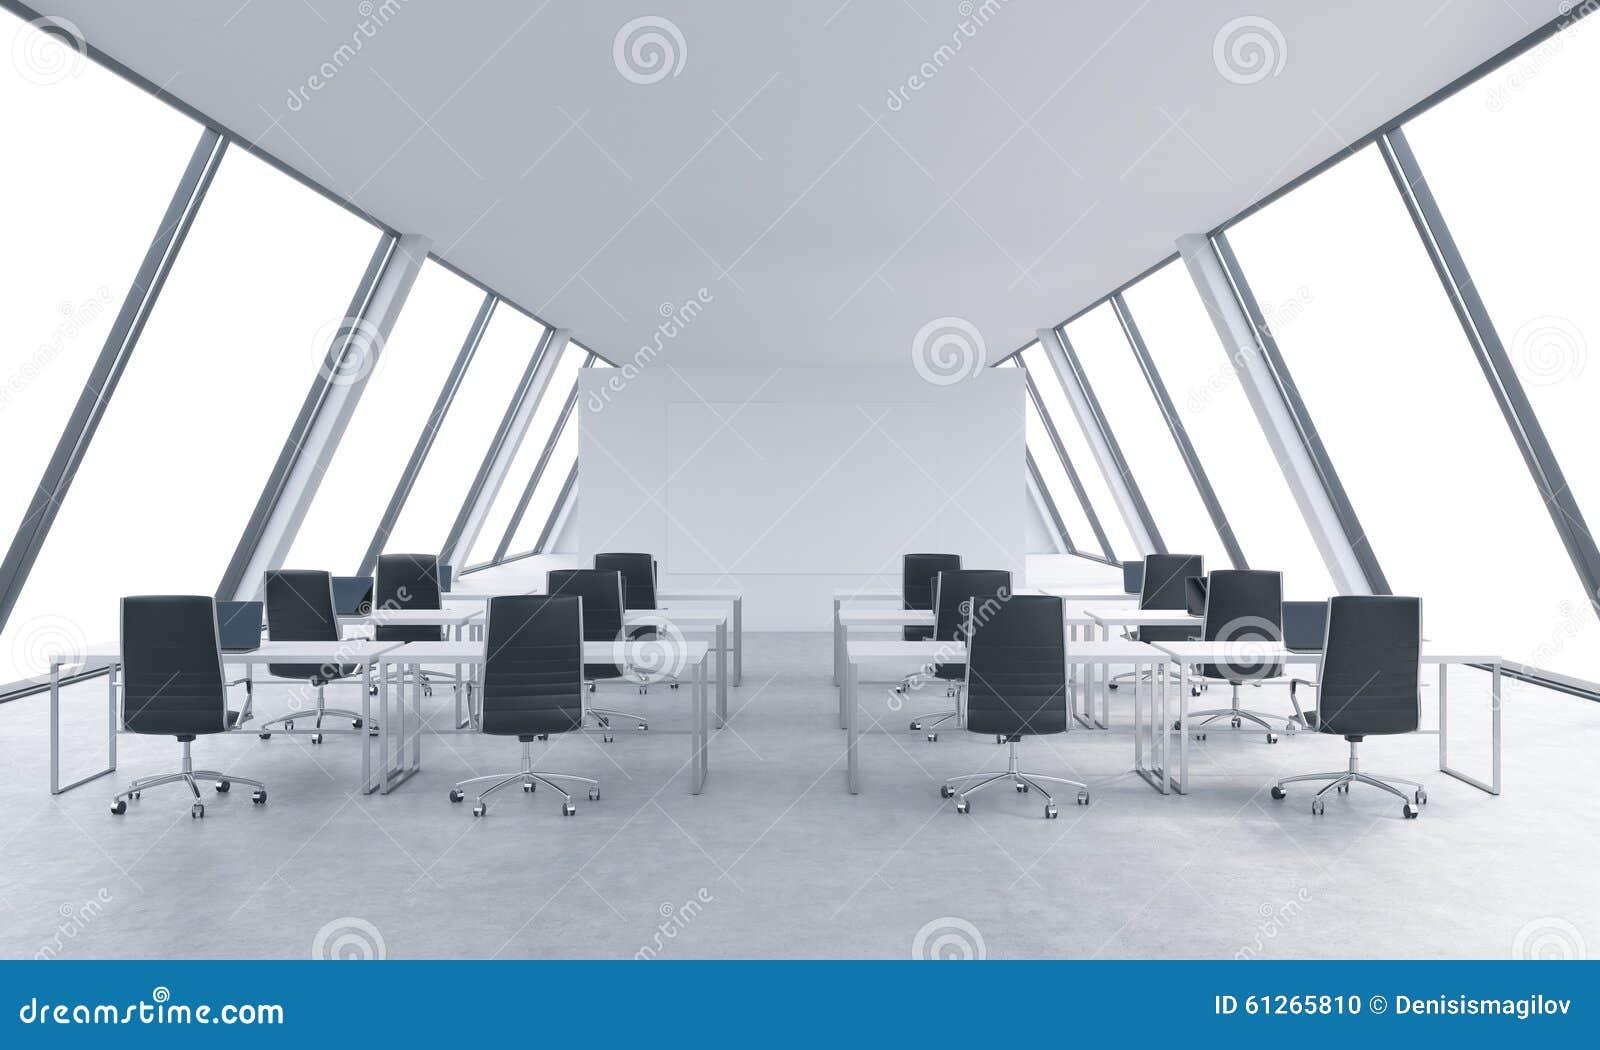 Bright Define Bright Office Listen Understand Define Design And Deliver Bright